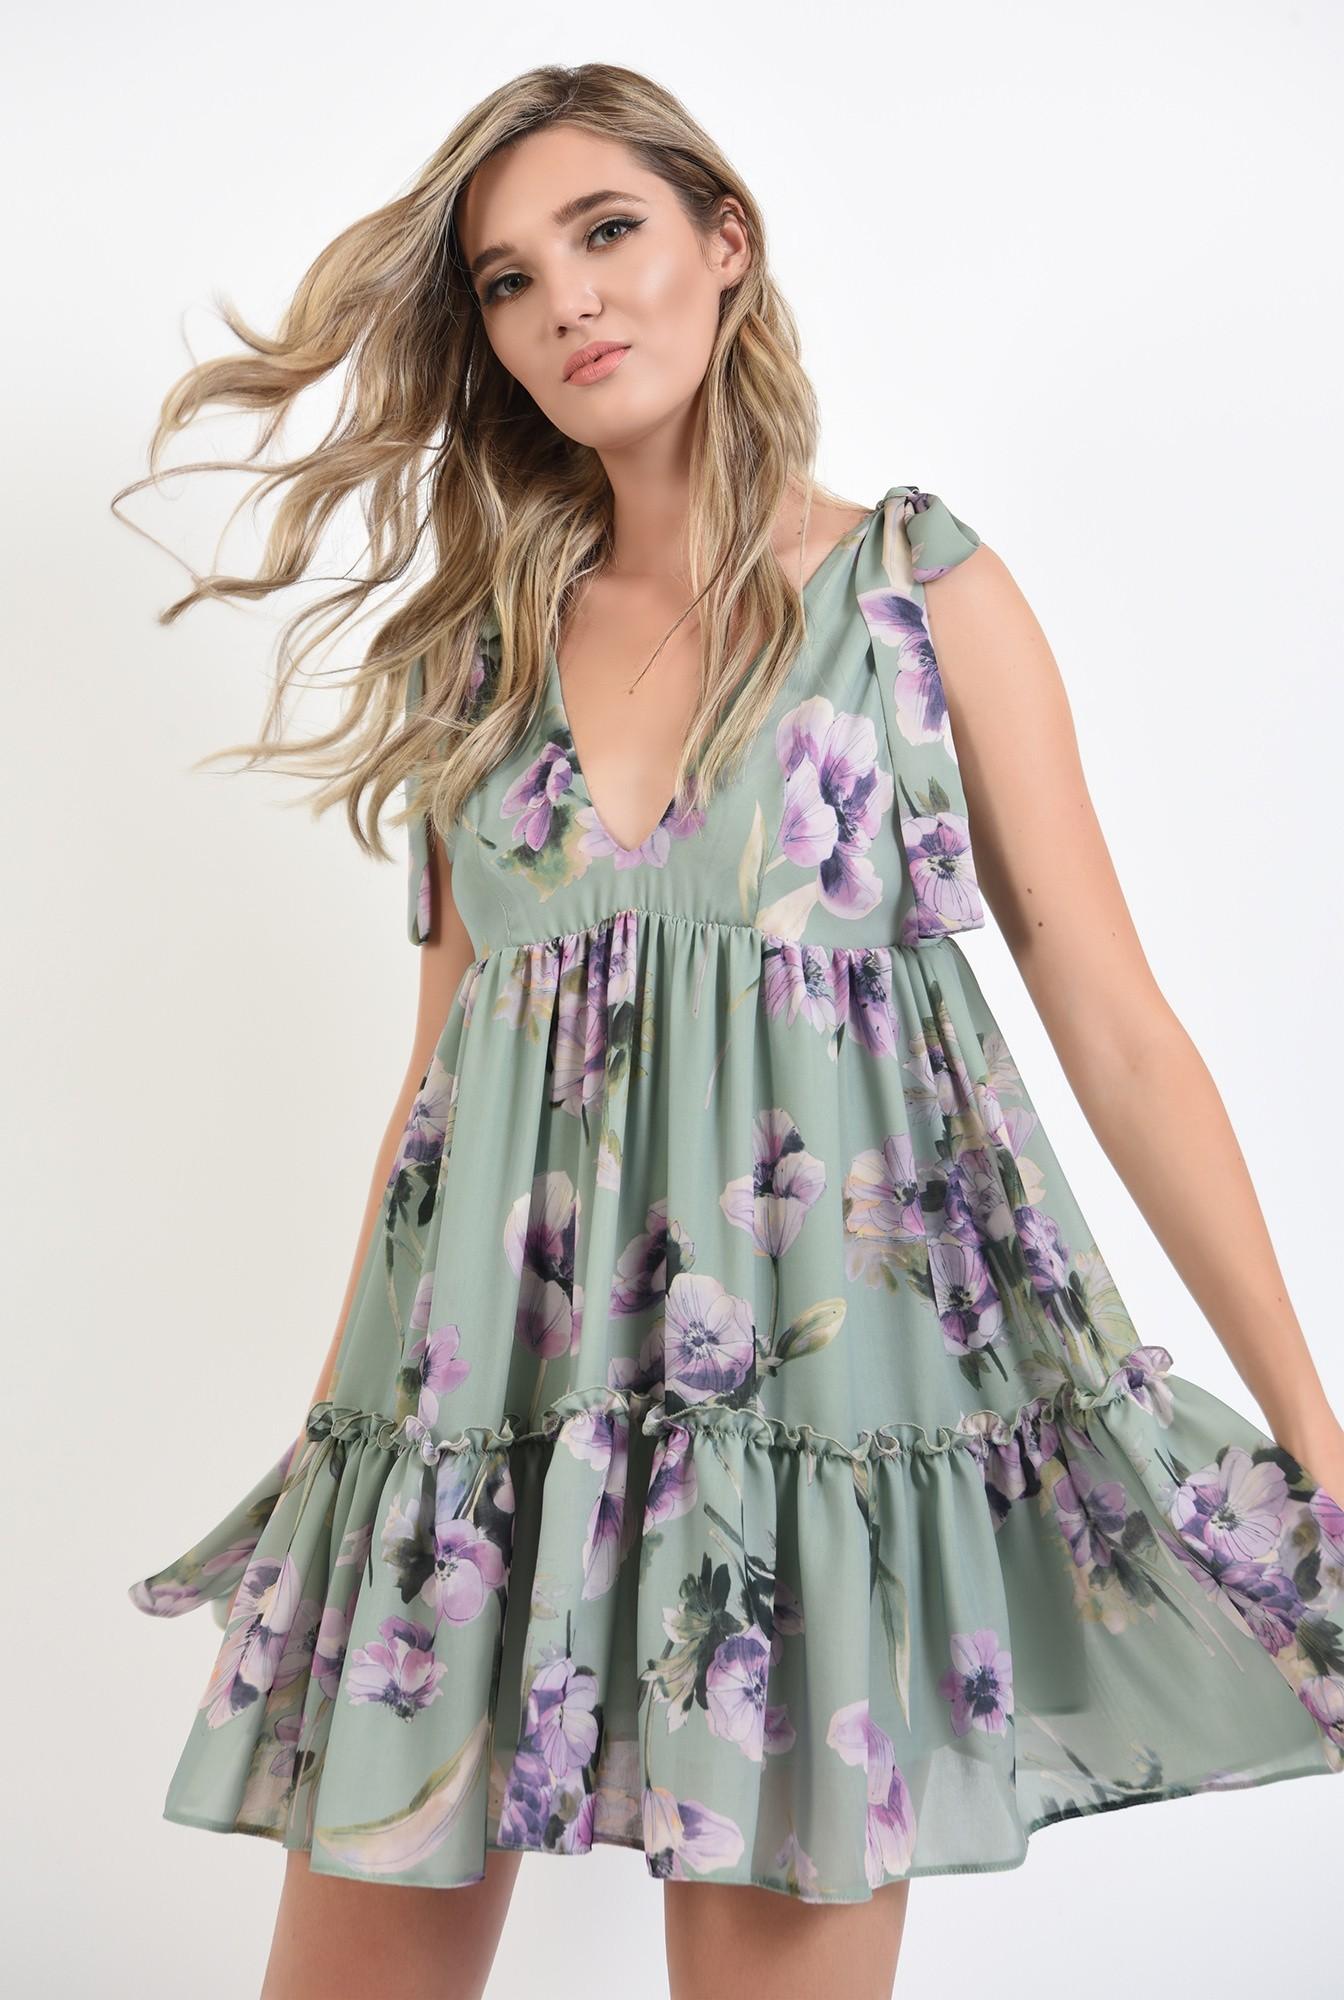 2 - 360 - rochie mini, larga, cu flori, Poema